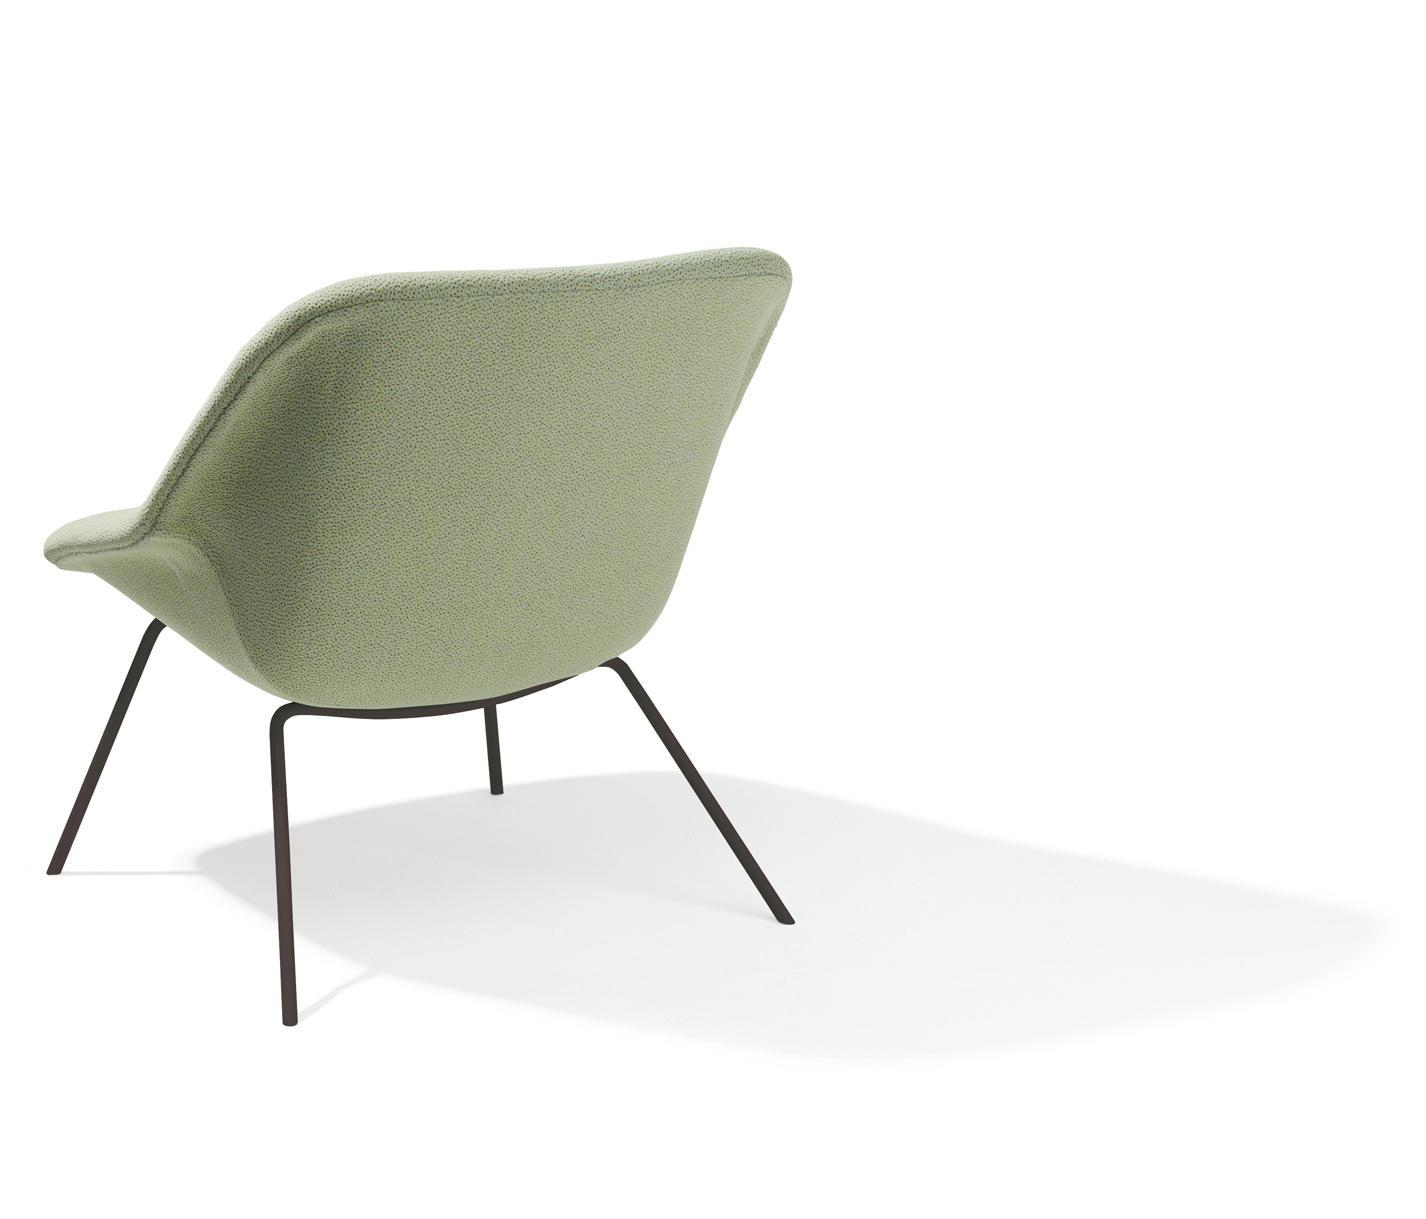 h 55 sessel loungesessel von richard lampert architonic. Black Bedroom Furniture Sets. Home Design Ideas